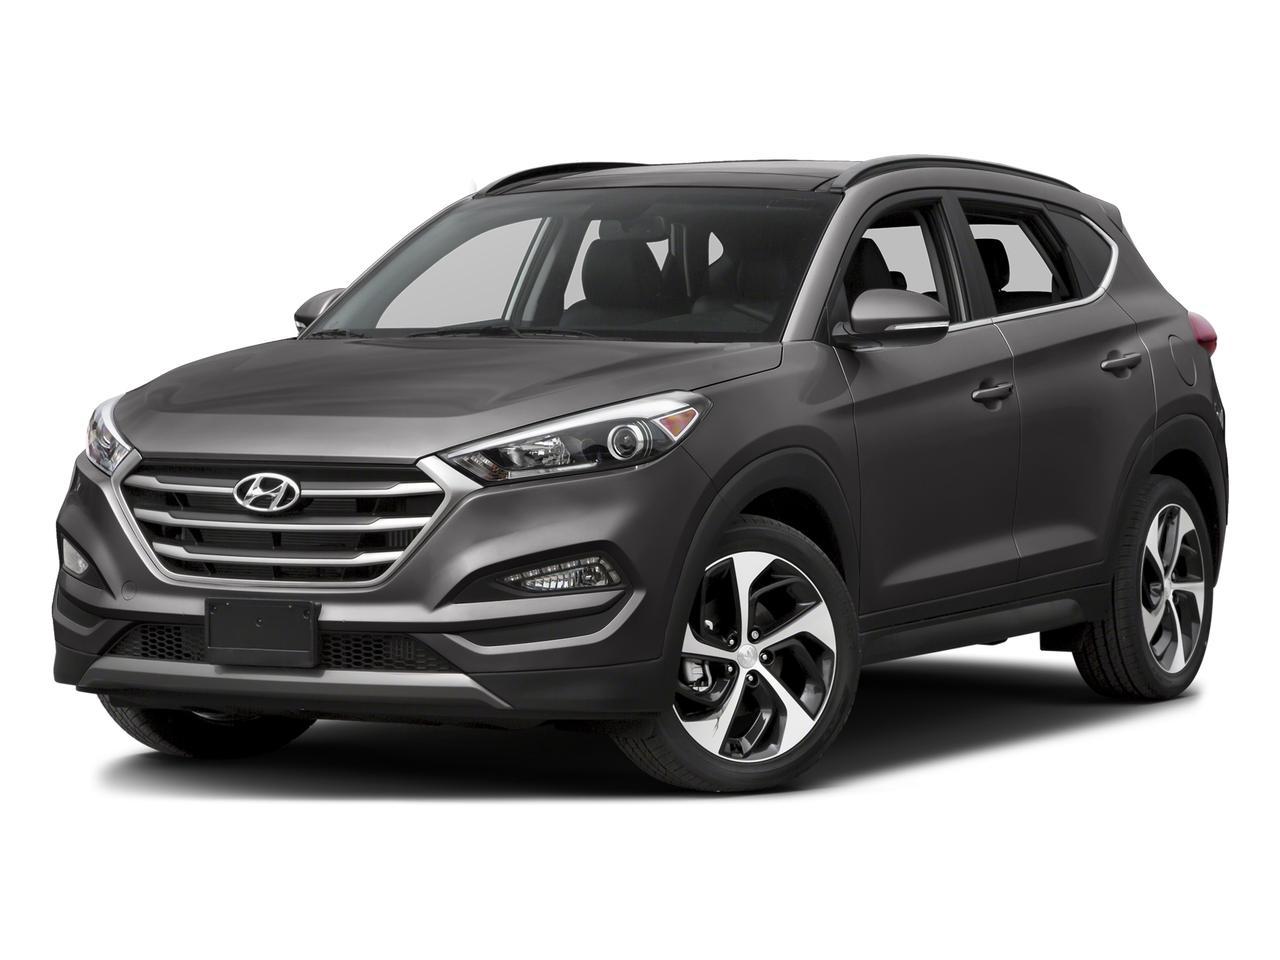 2016 Hyundai Tucson Vehicle Photo in Peoria, IL 61615